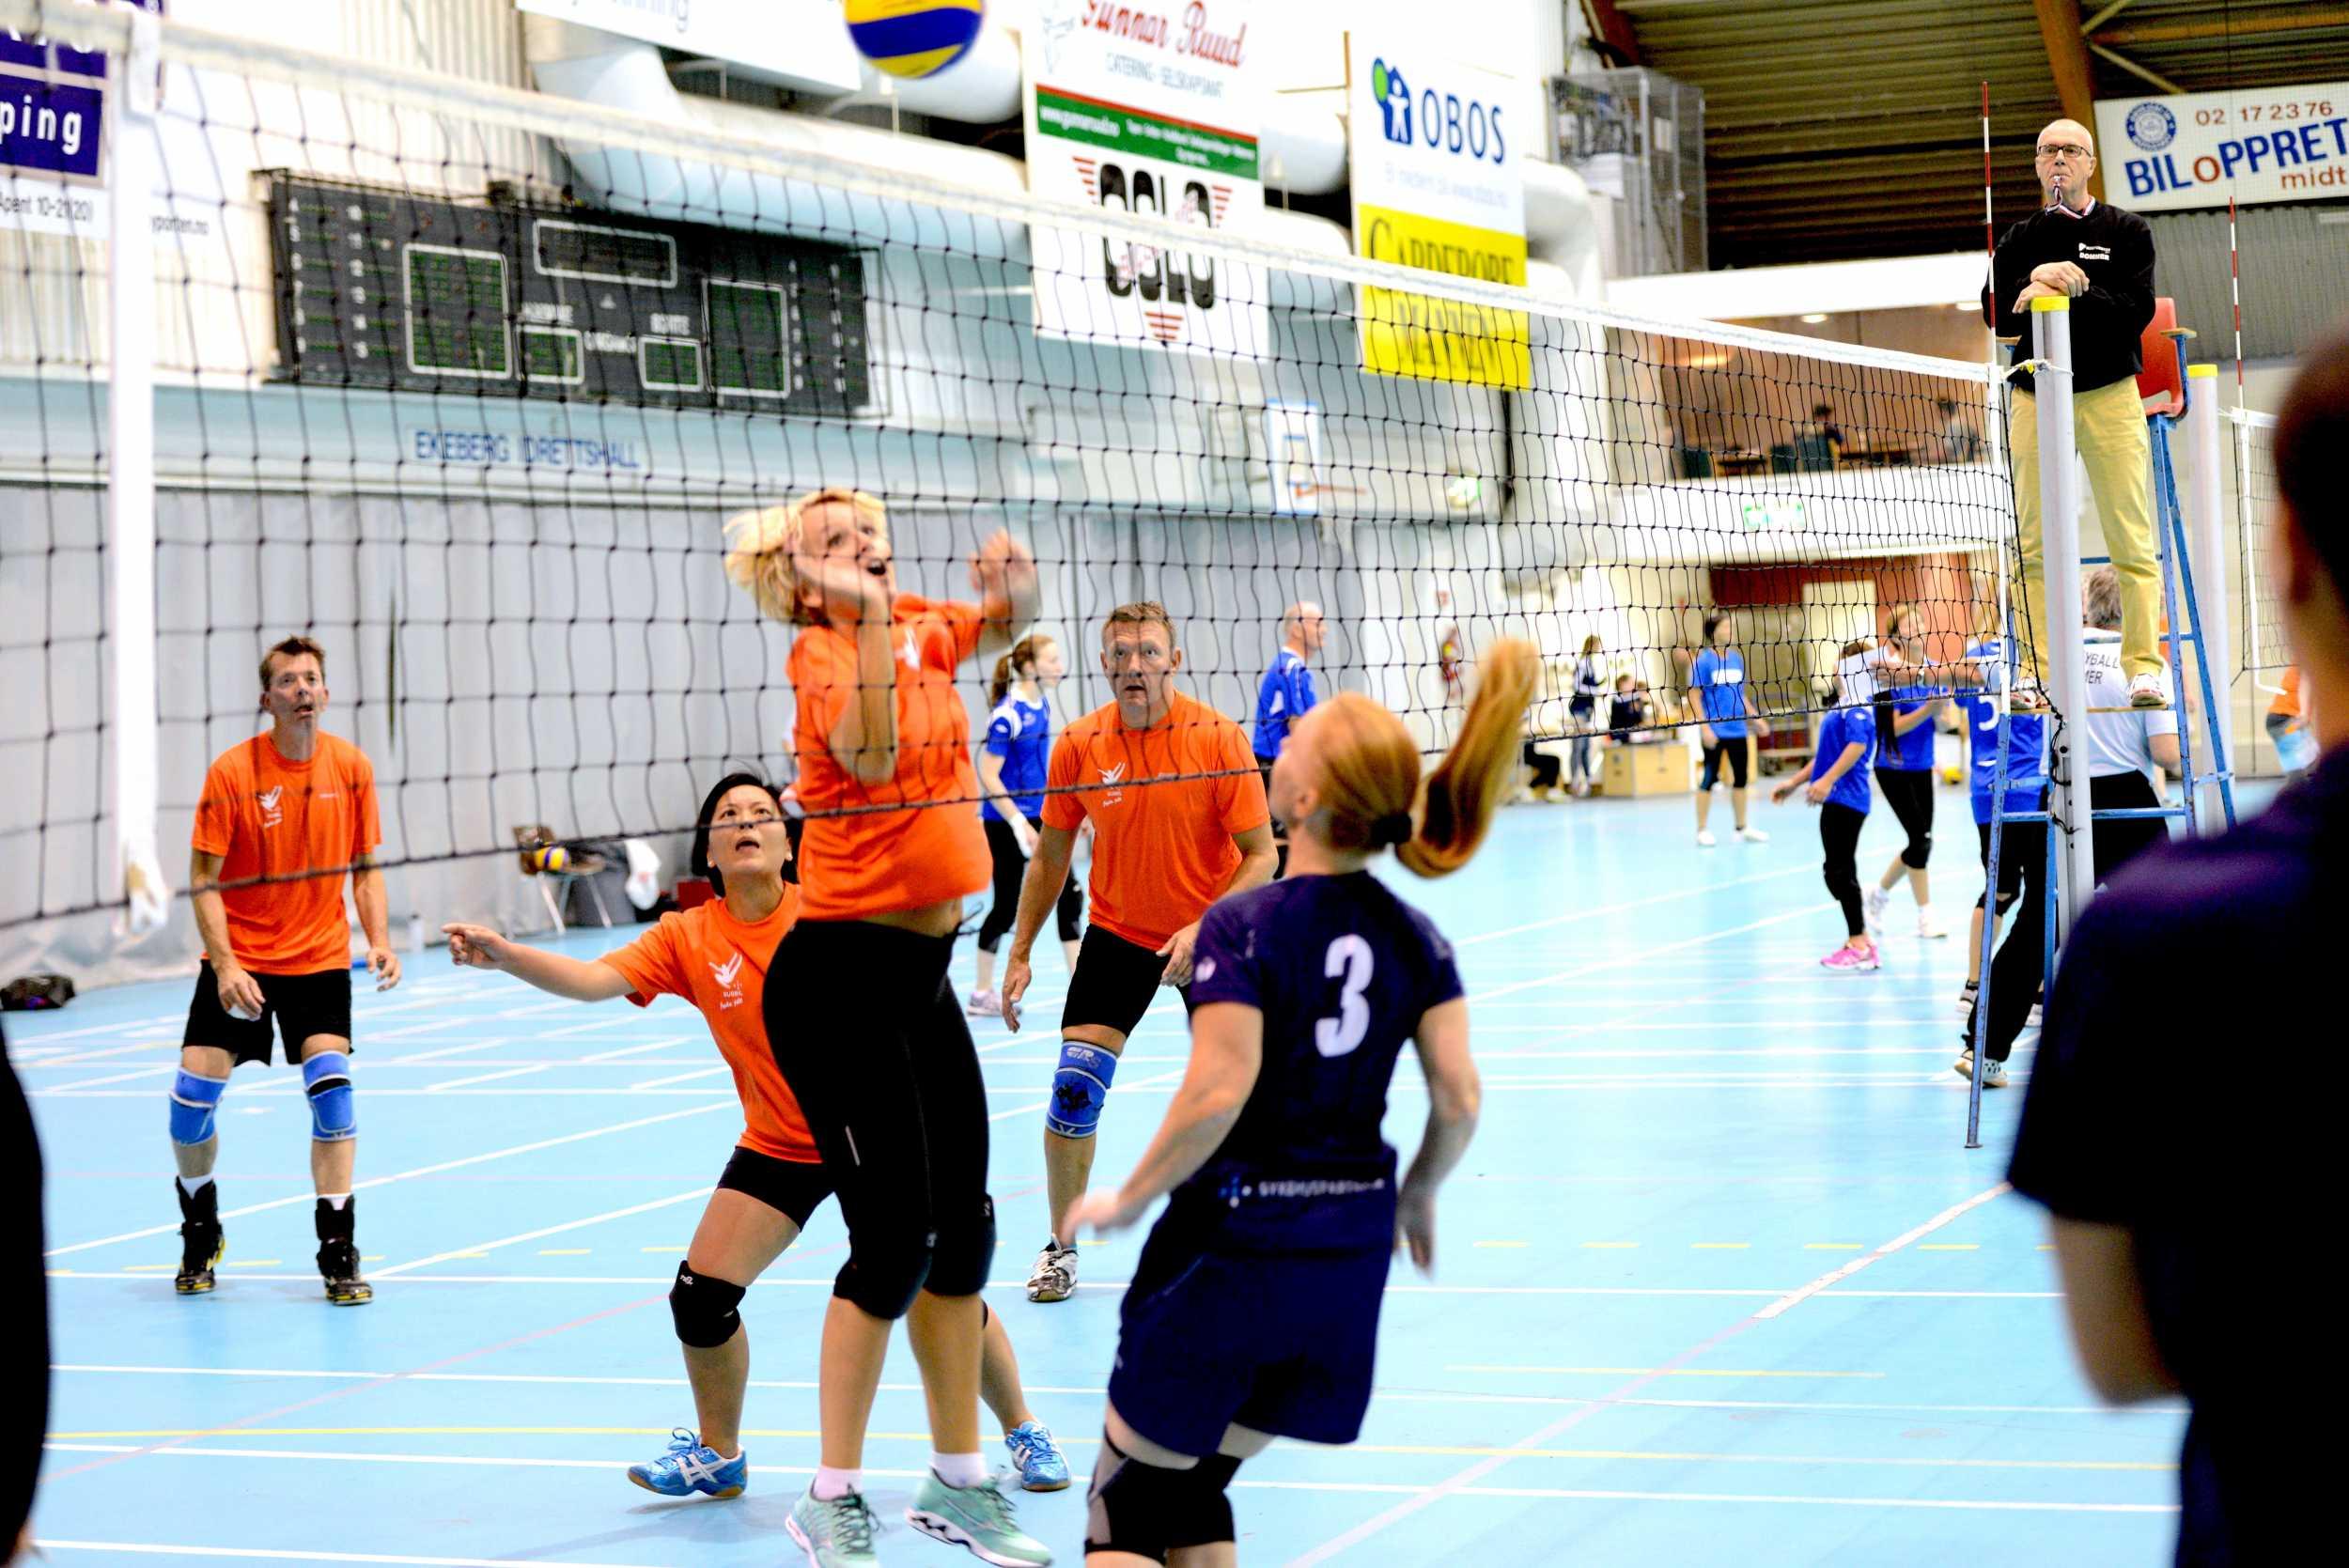 helsenm-2015-oslo-foto-svein-lunde_21004973592_o.j